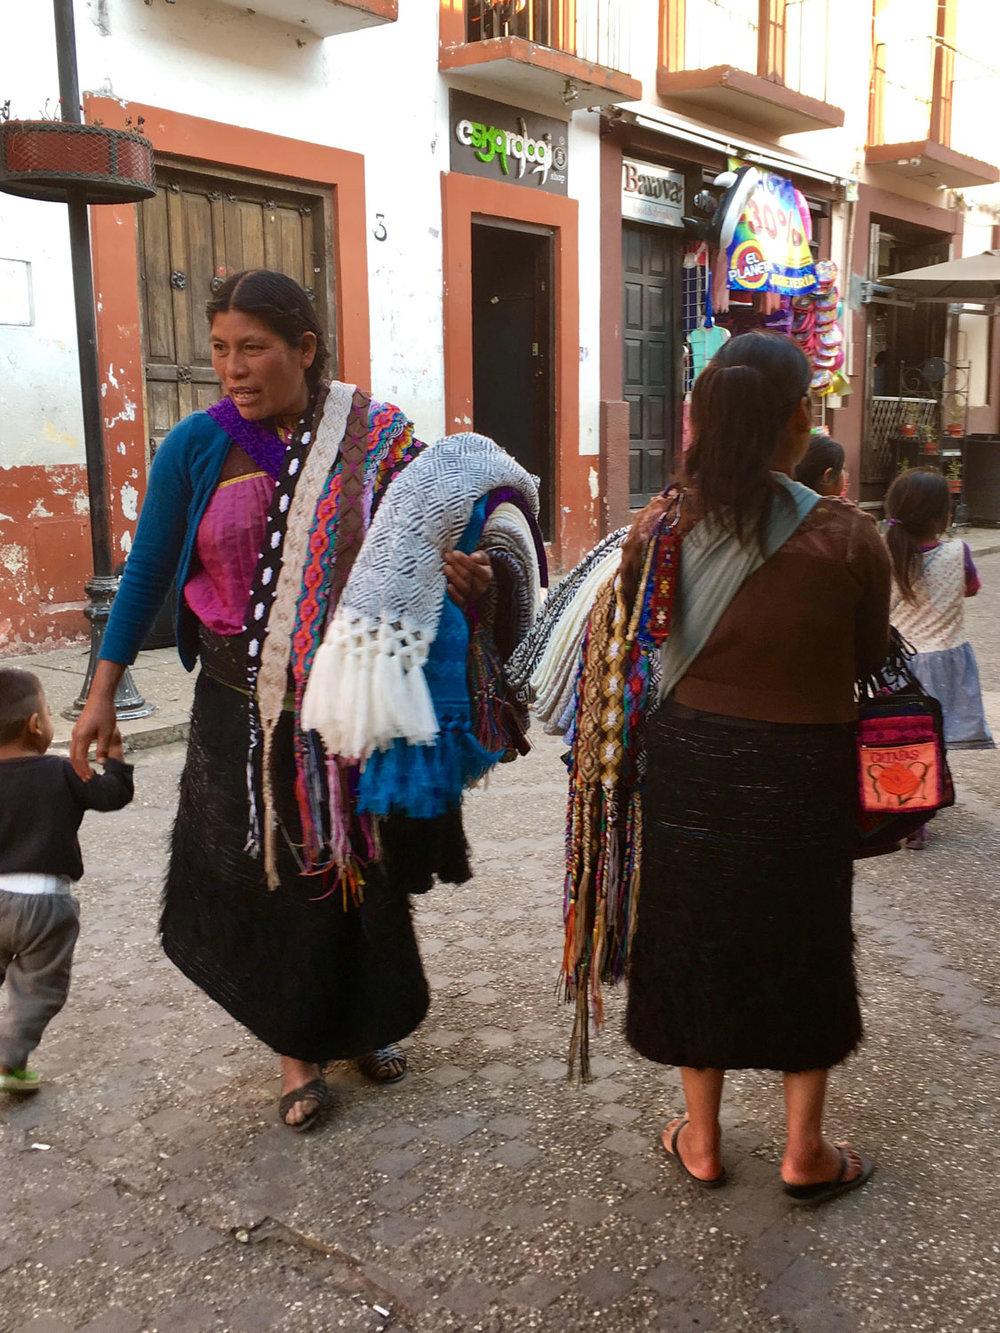 Hammocks_and_Ruins_Town_Villages_Chiapas_San_Cristobal_de_las_Casas_30.jpg